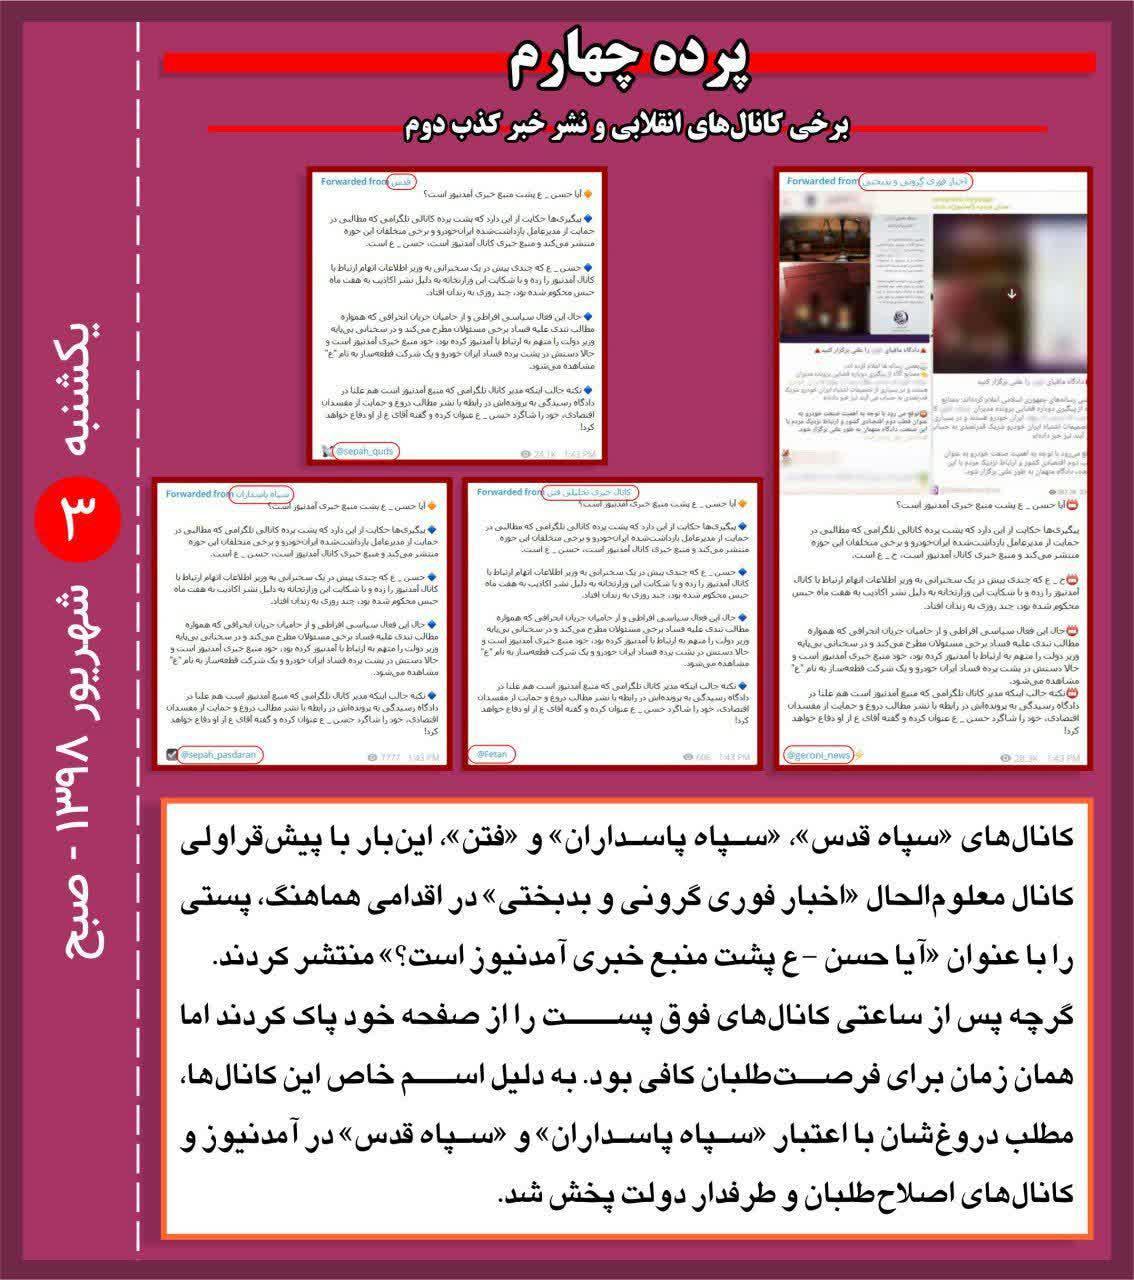 http://dl-abbasi.ir/yekta/1398/Graphic/RMT/4.jpg